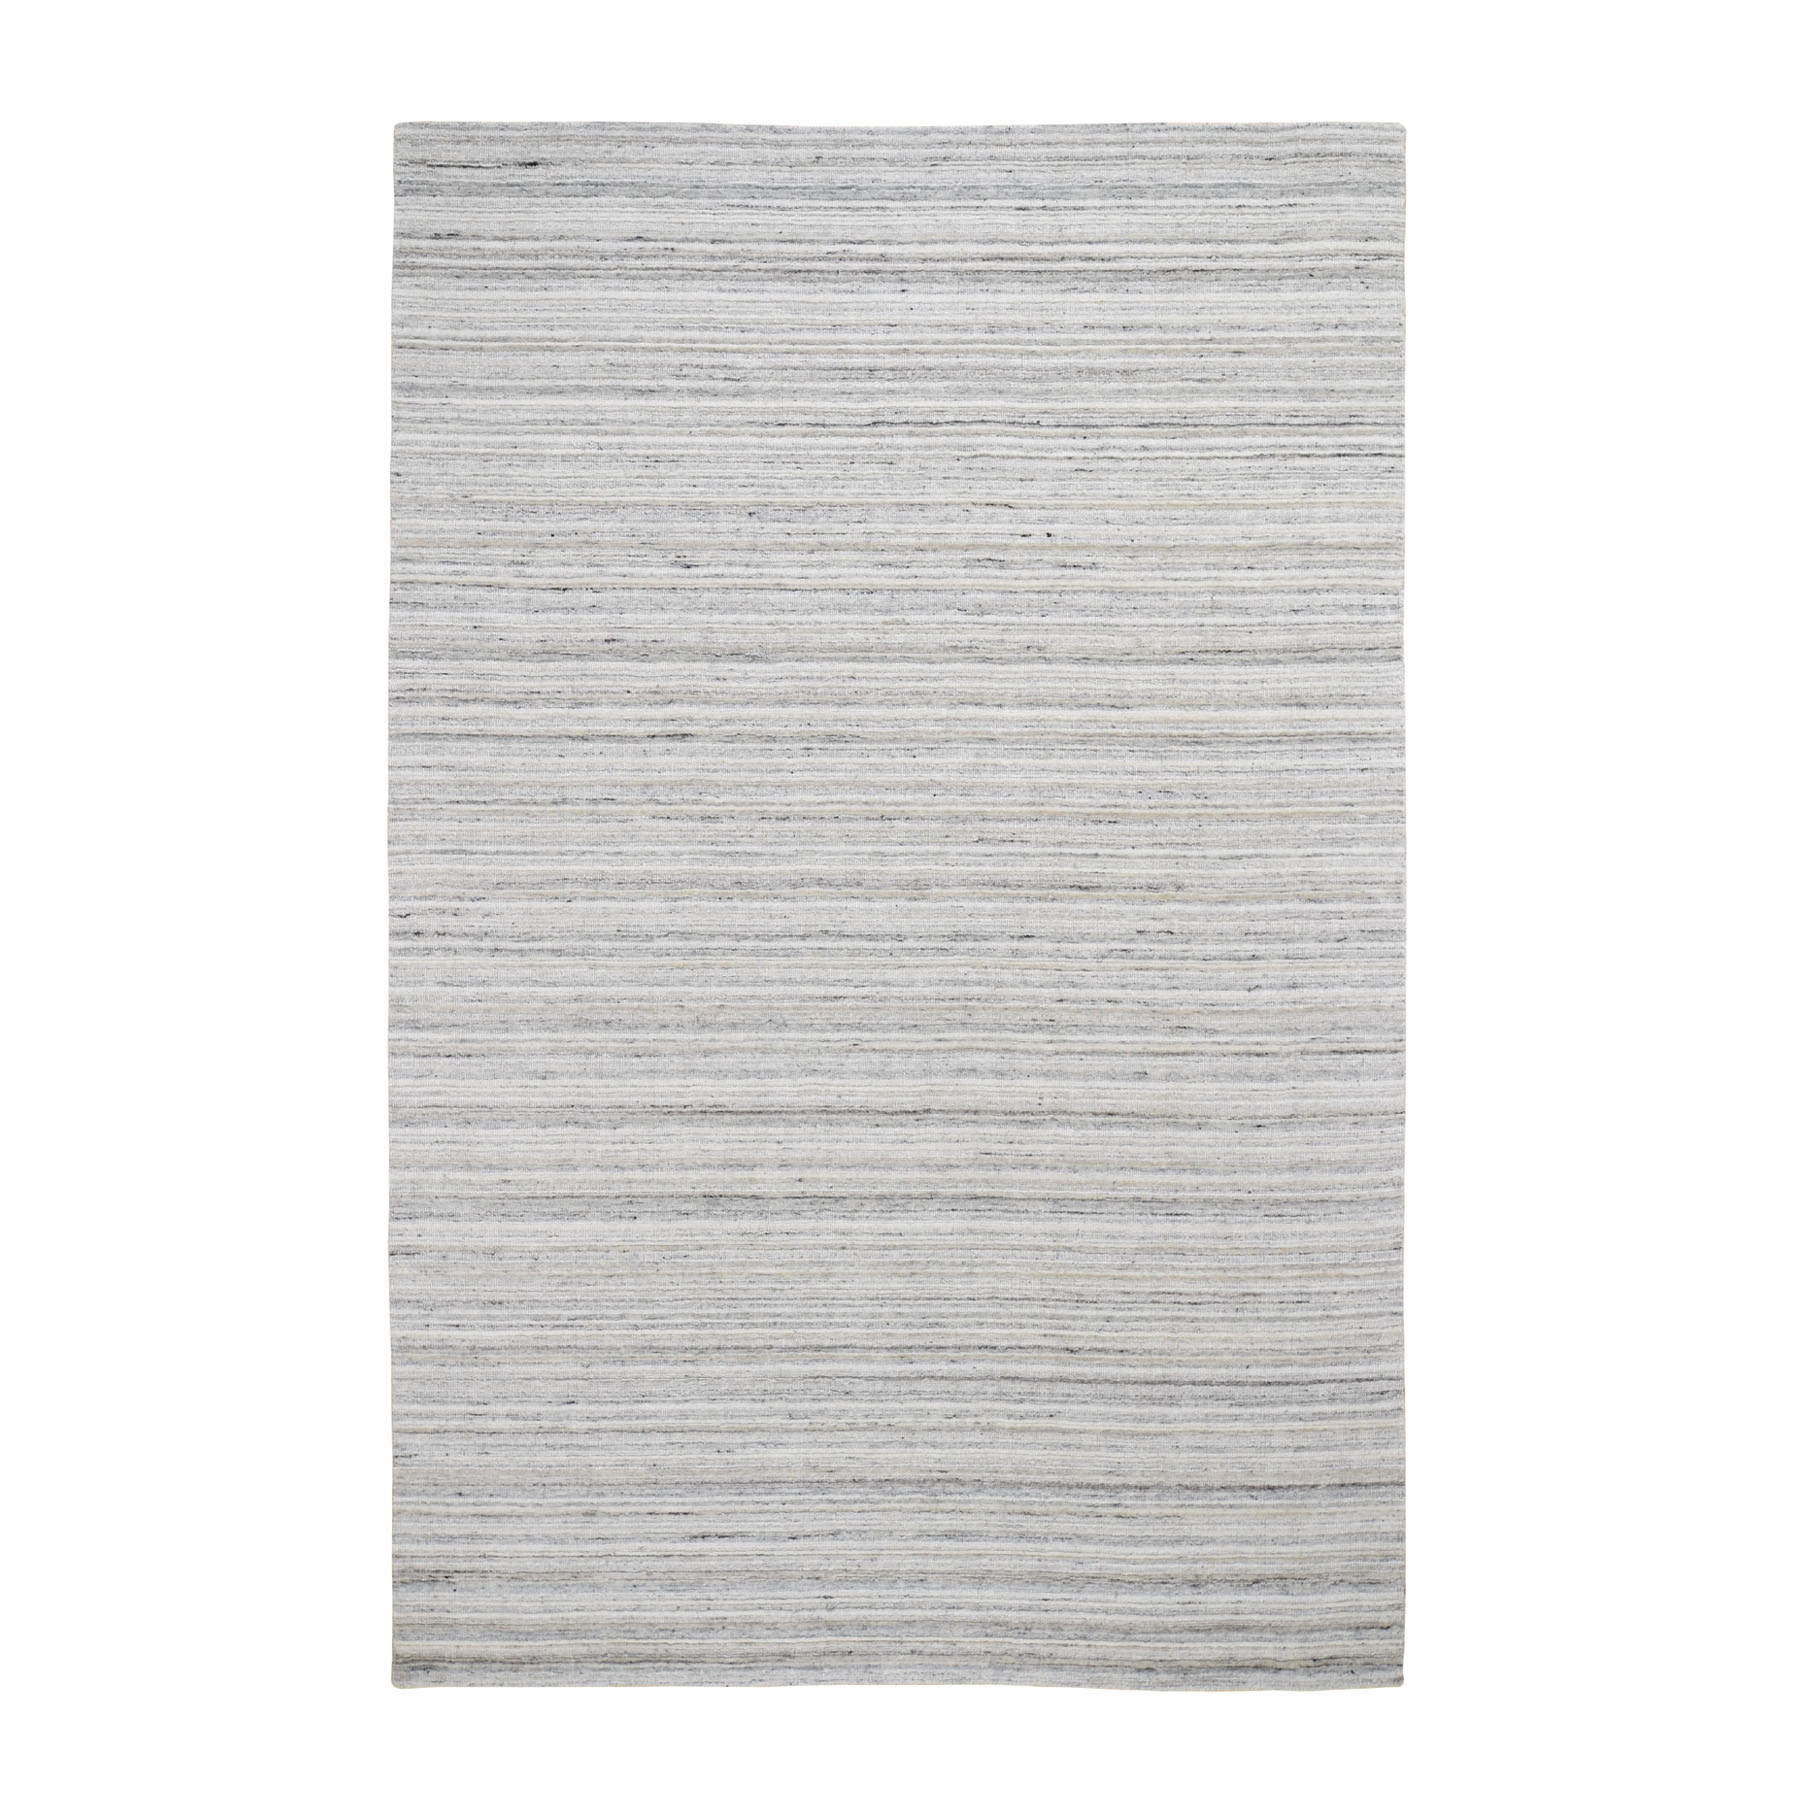 6'x9' Ivory Hand Loomed Pure Wool Plain Modern Oriental Rug 48271